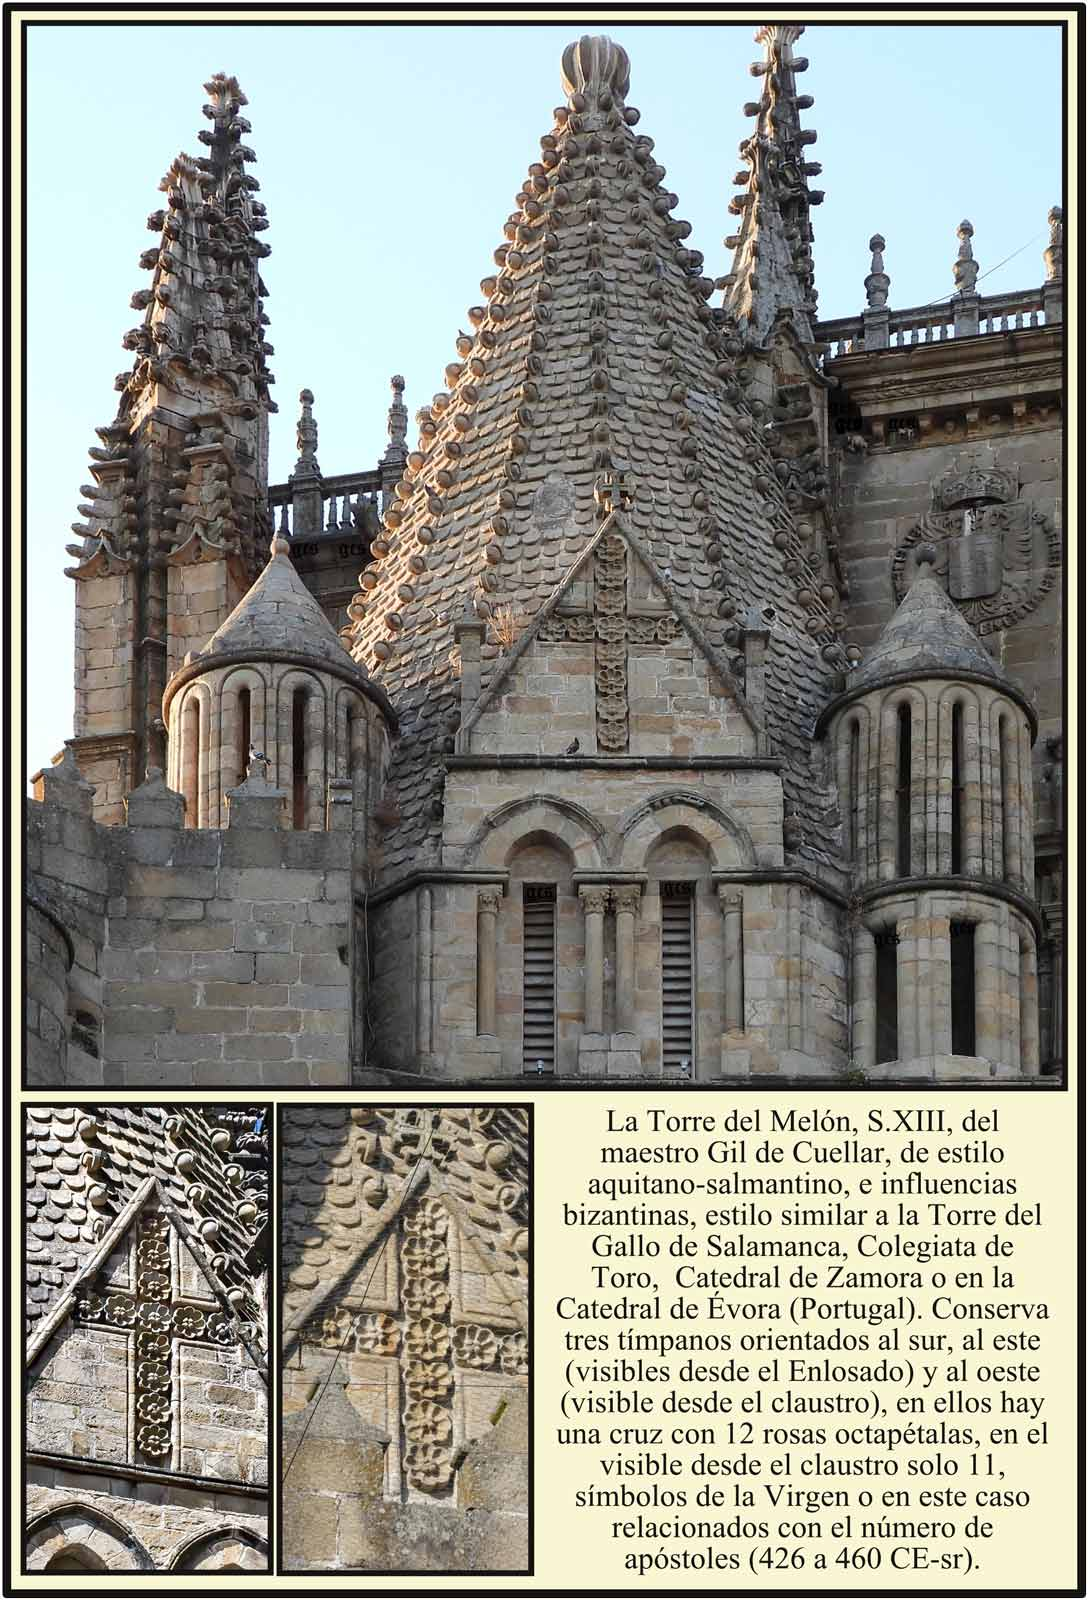 Torre del Melon de estilo romanico siglo XIII Plasencia